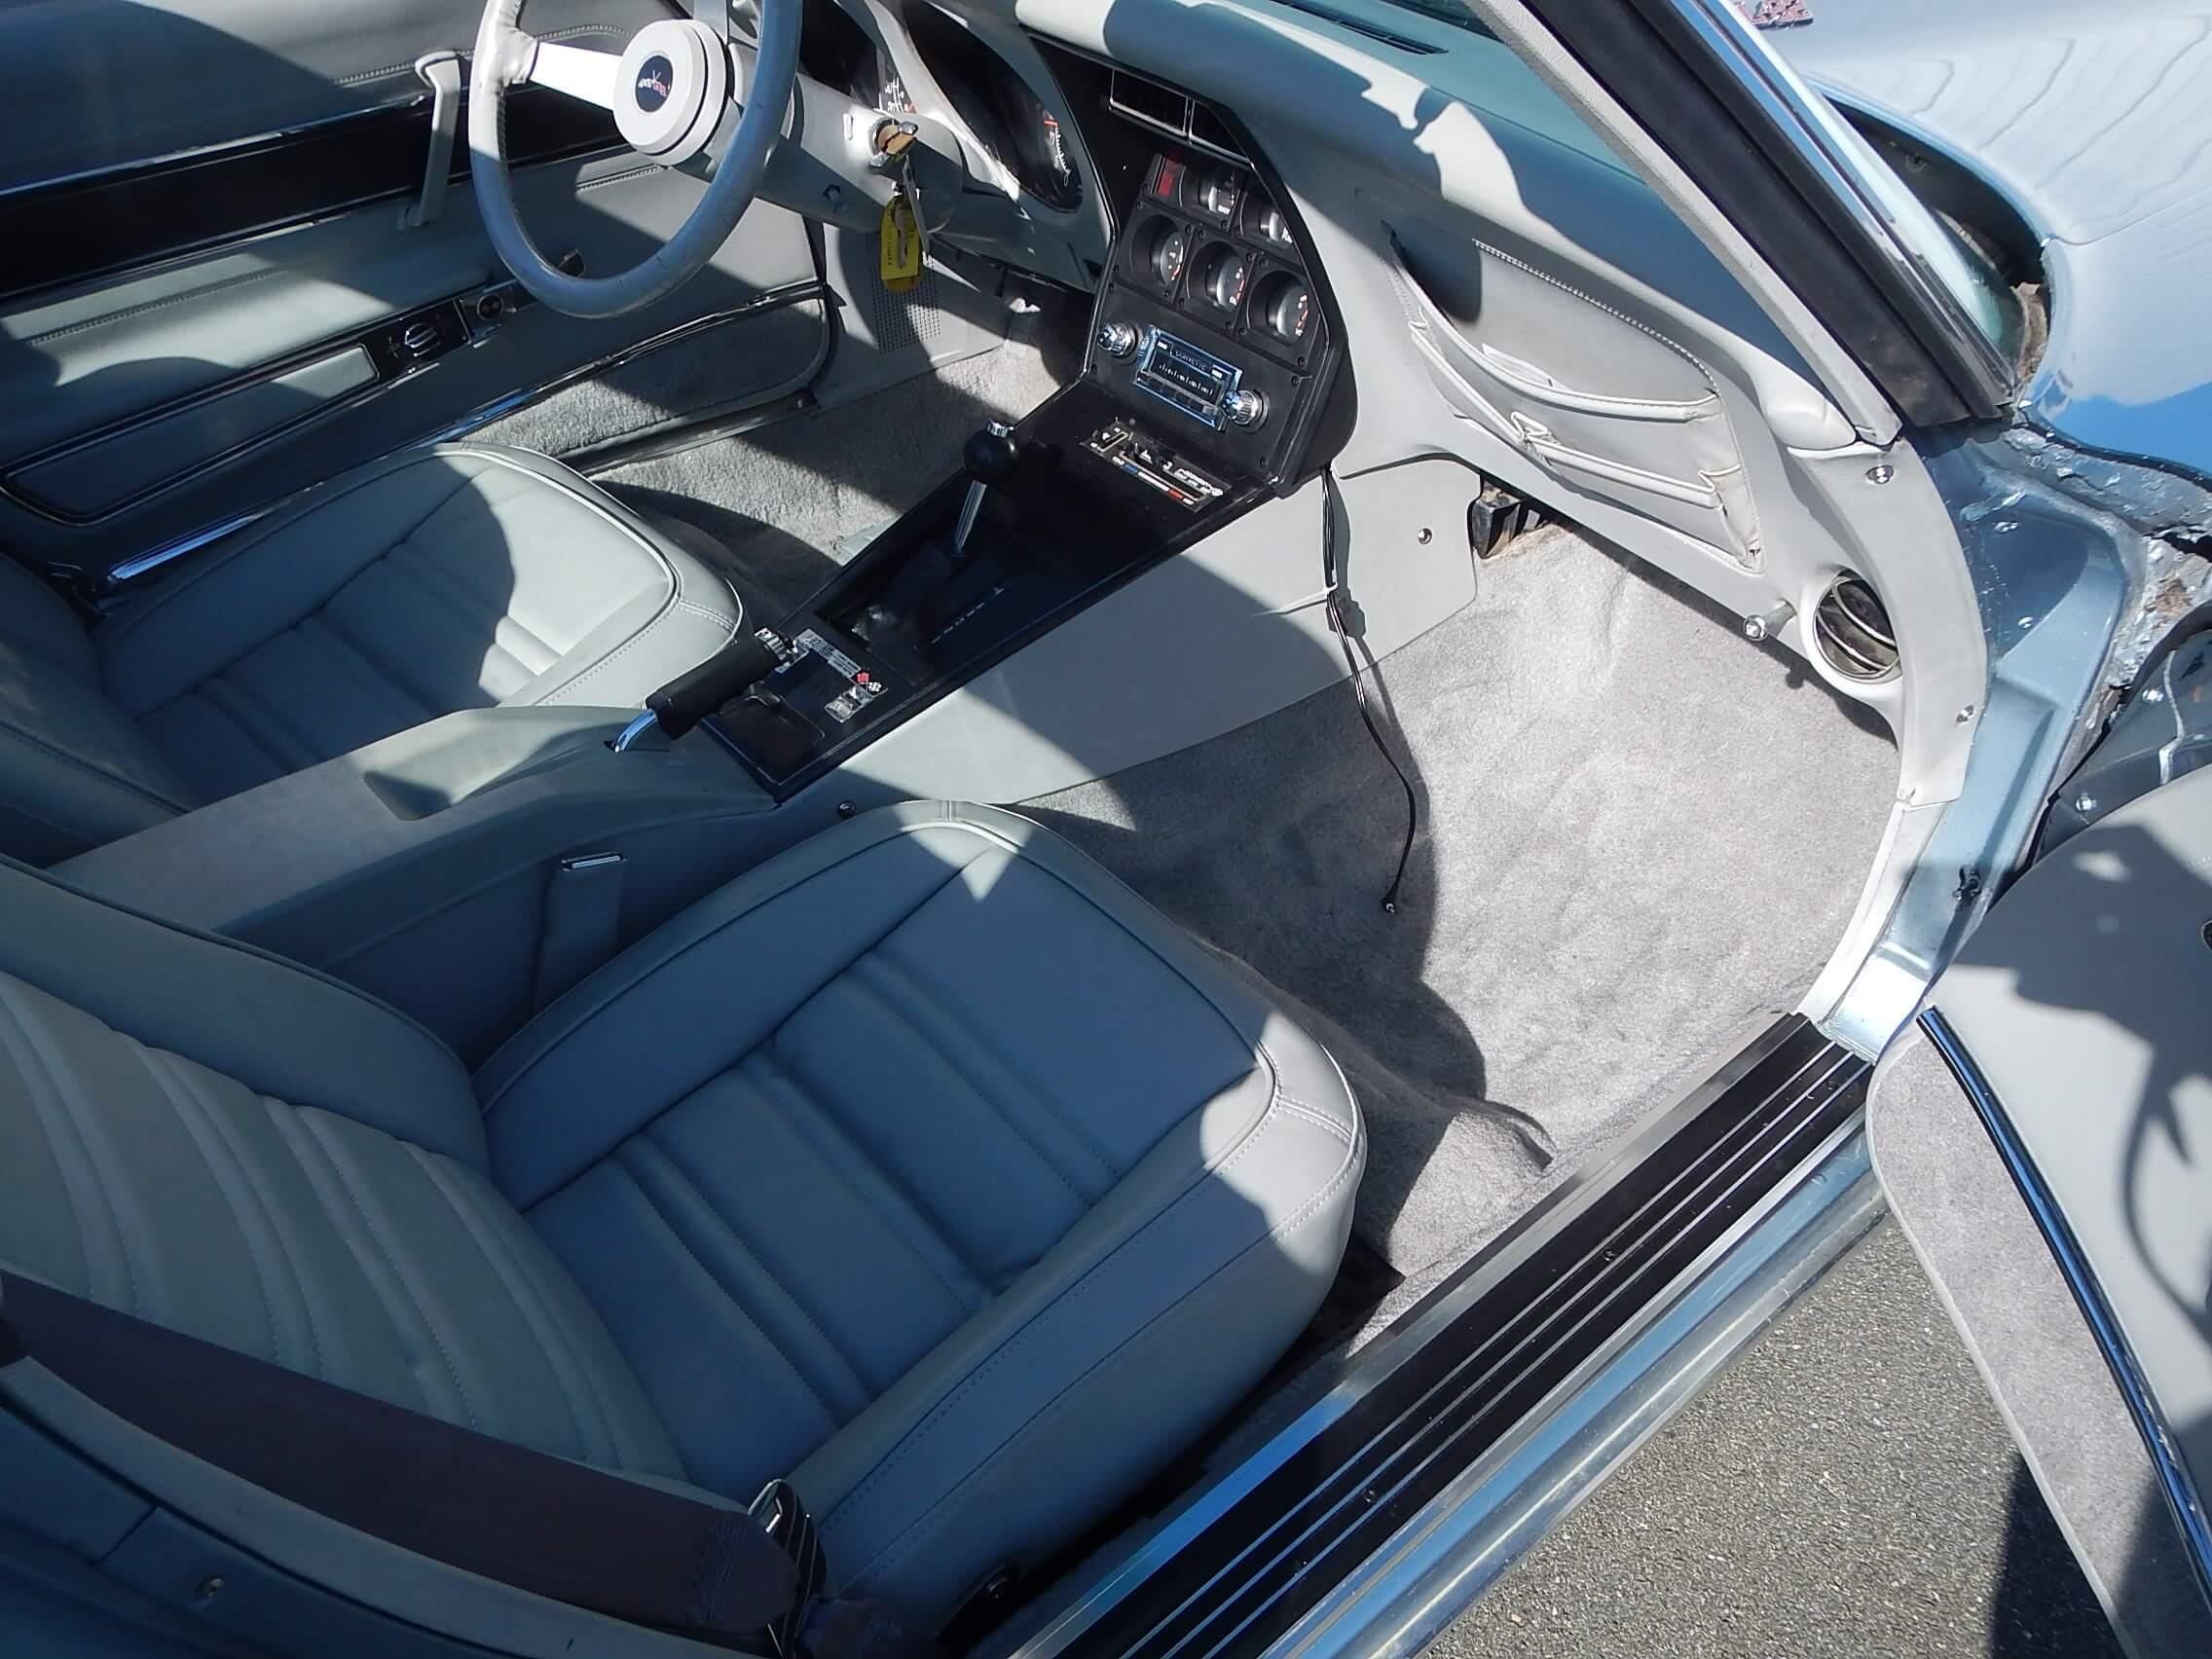 1977 Corvette Coupe restoration 62.JPG